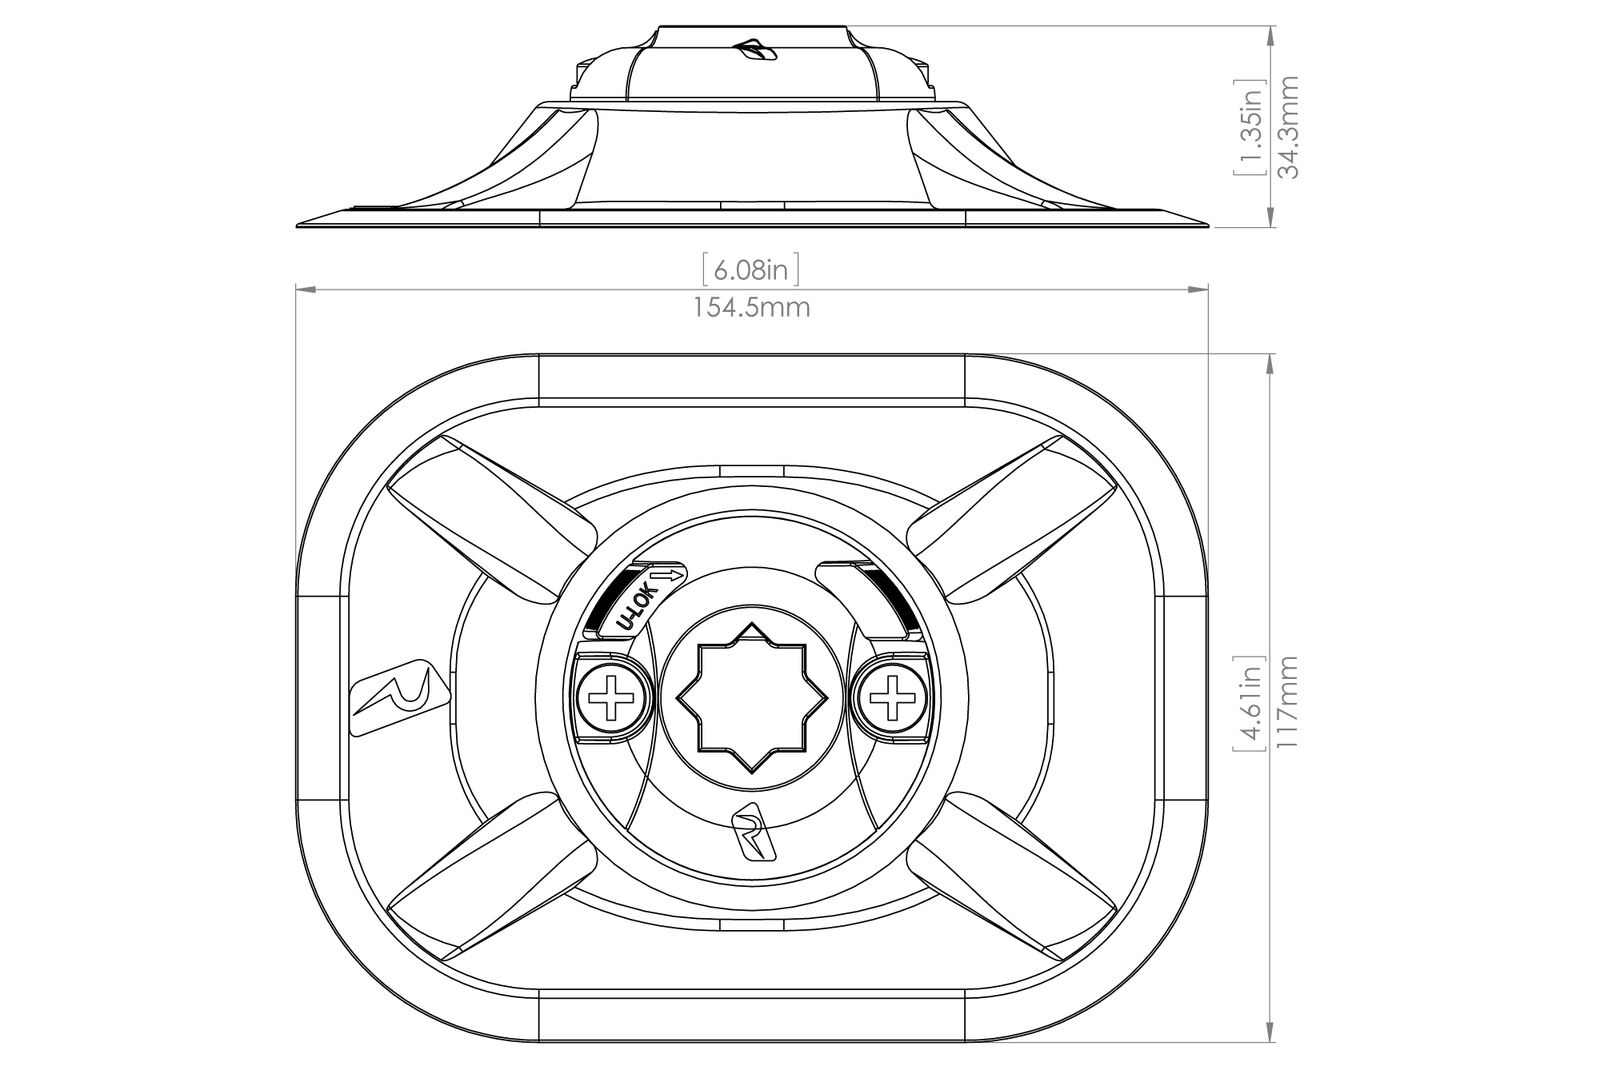 Set: Railblaza Railblaza Set: Ribport Halterung Außenhaut (schwarz) + Kleber Kit, 03-0006-11 ffae6d